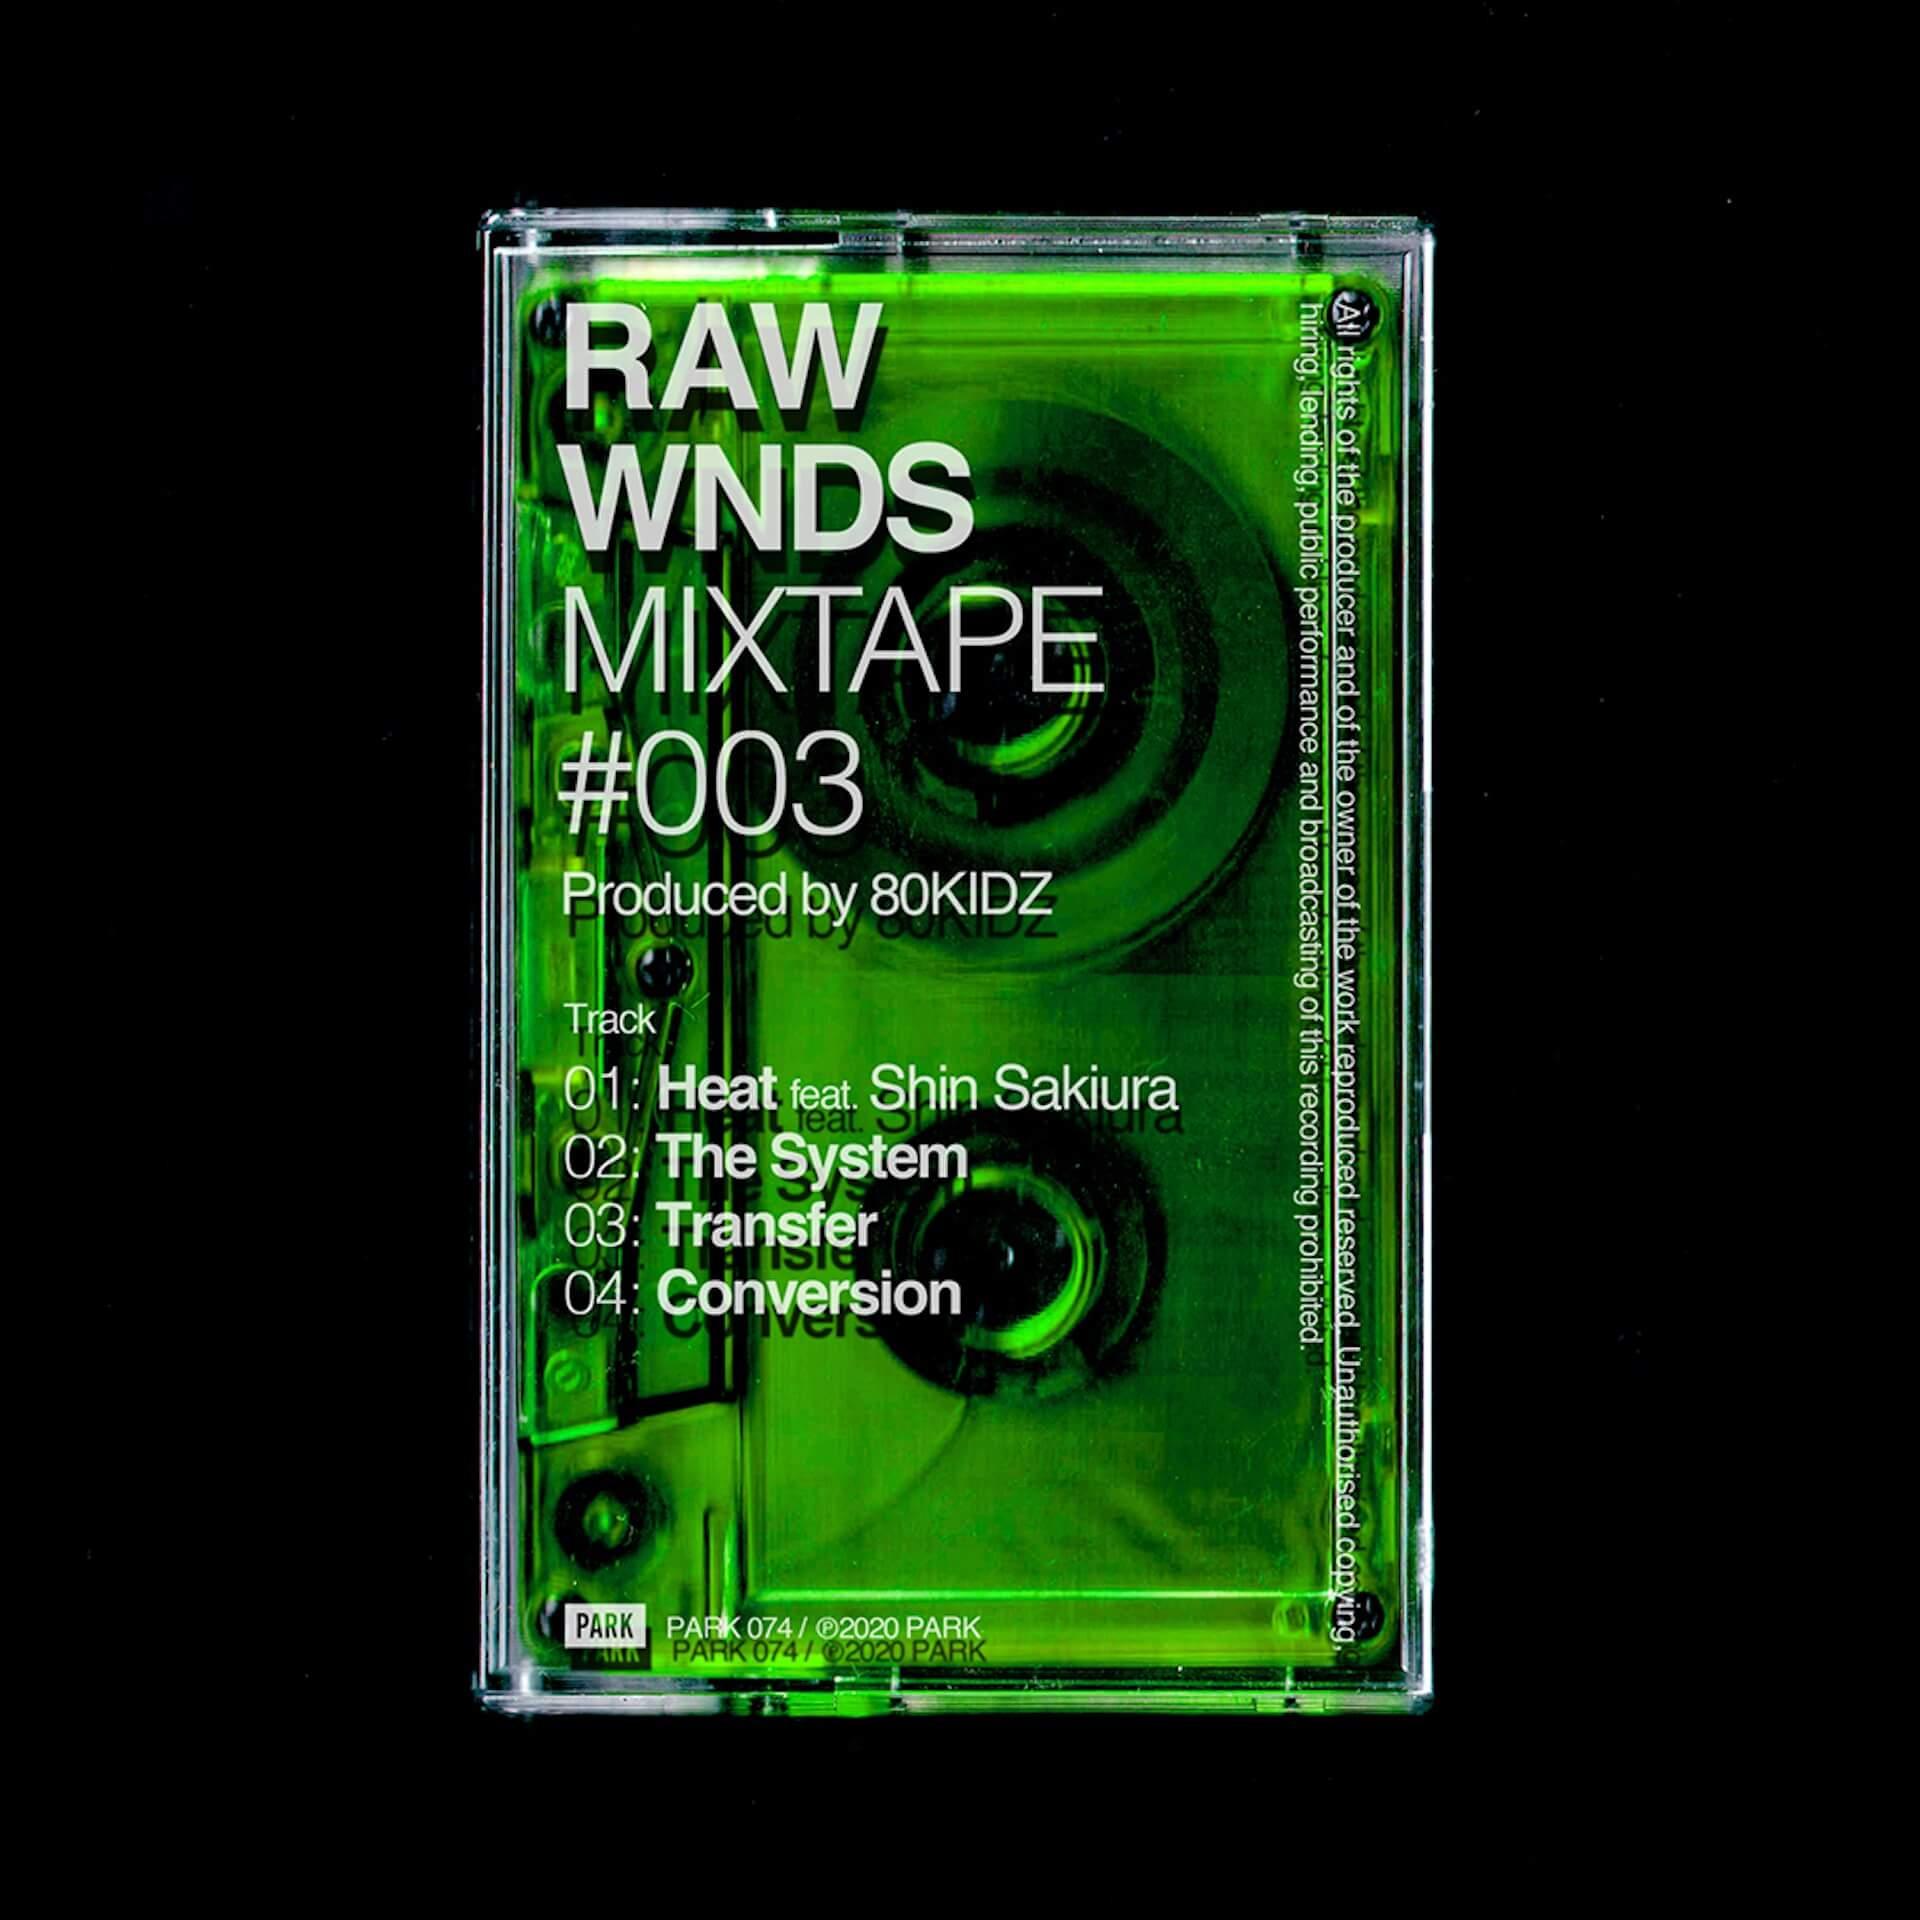 80KIDZがShin Sakiuraとの共作も収録の新作EP『RAW WNDS MIXTAPE #003』を配信&数量限定カセットテープでリリース! music200814_80kidz_01